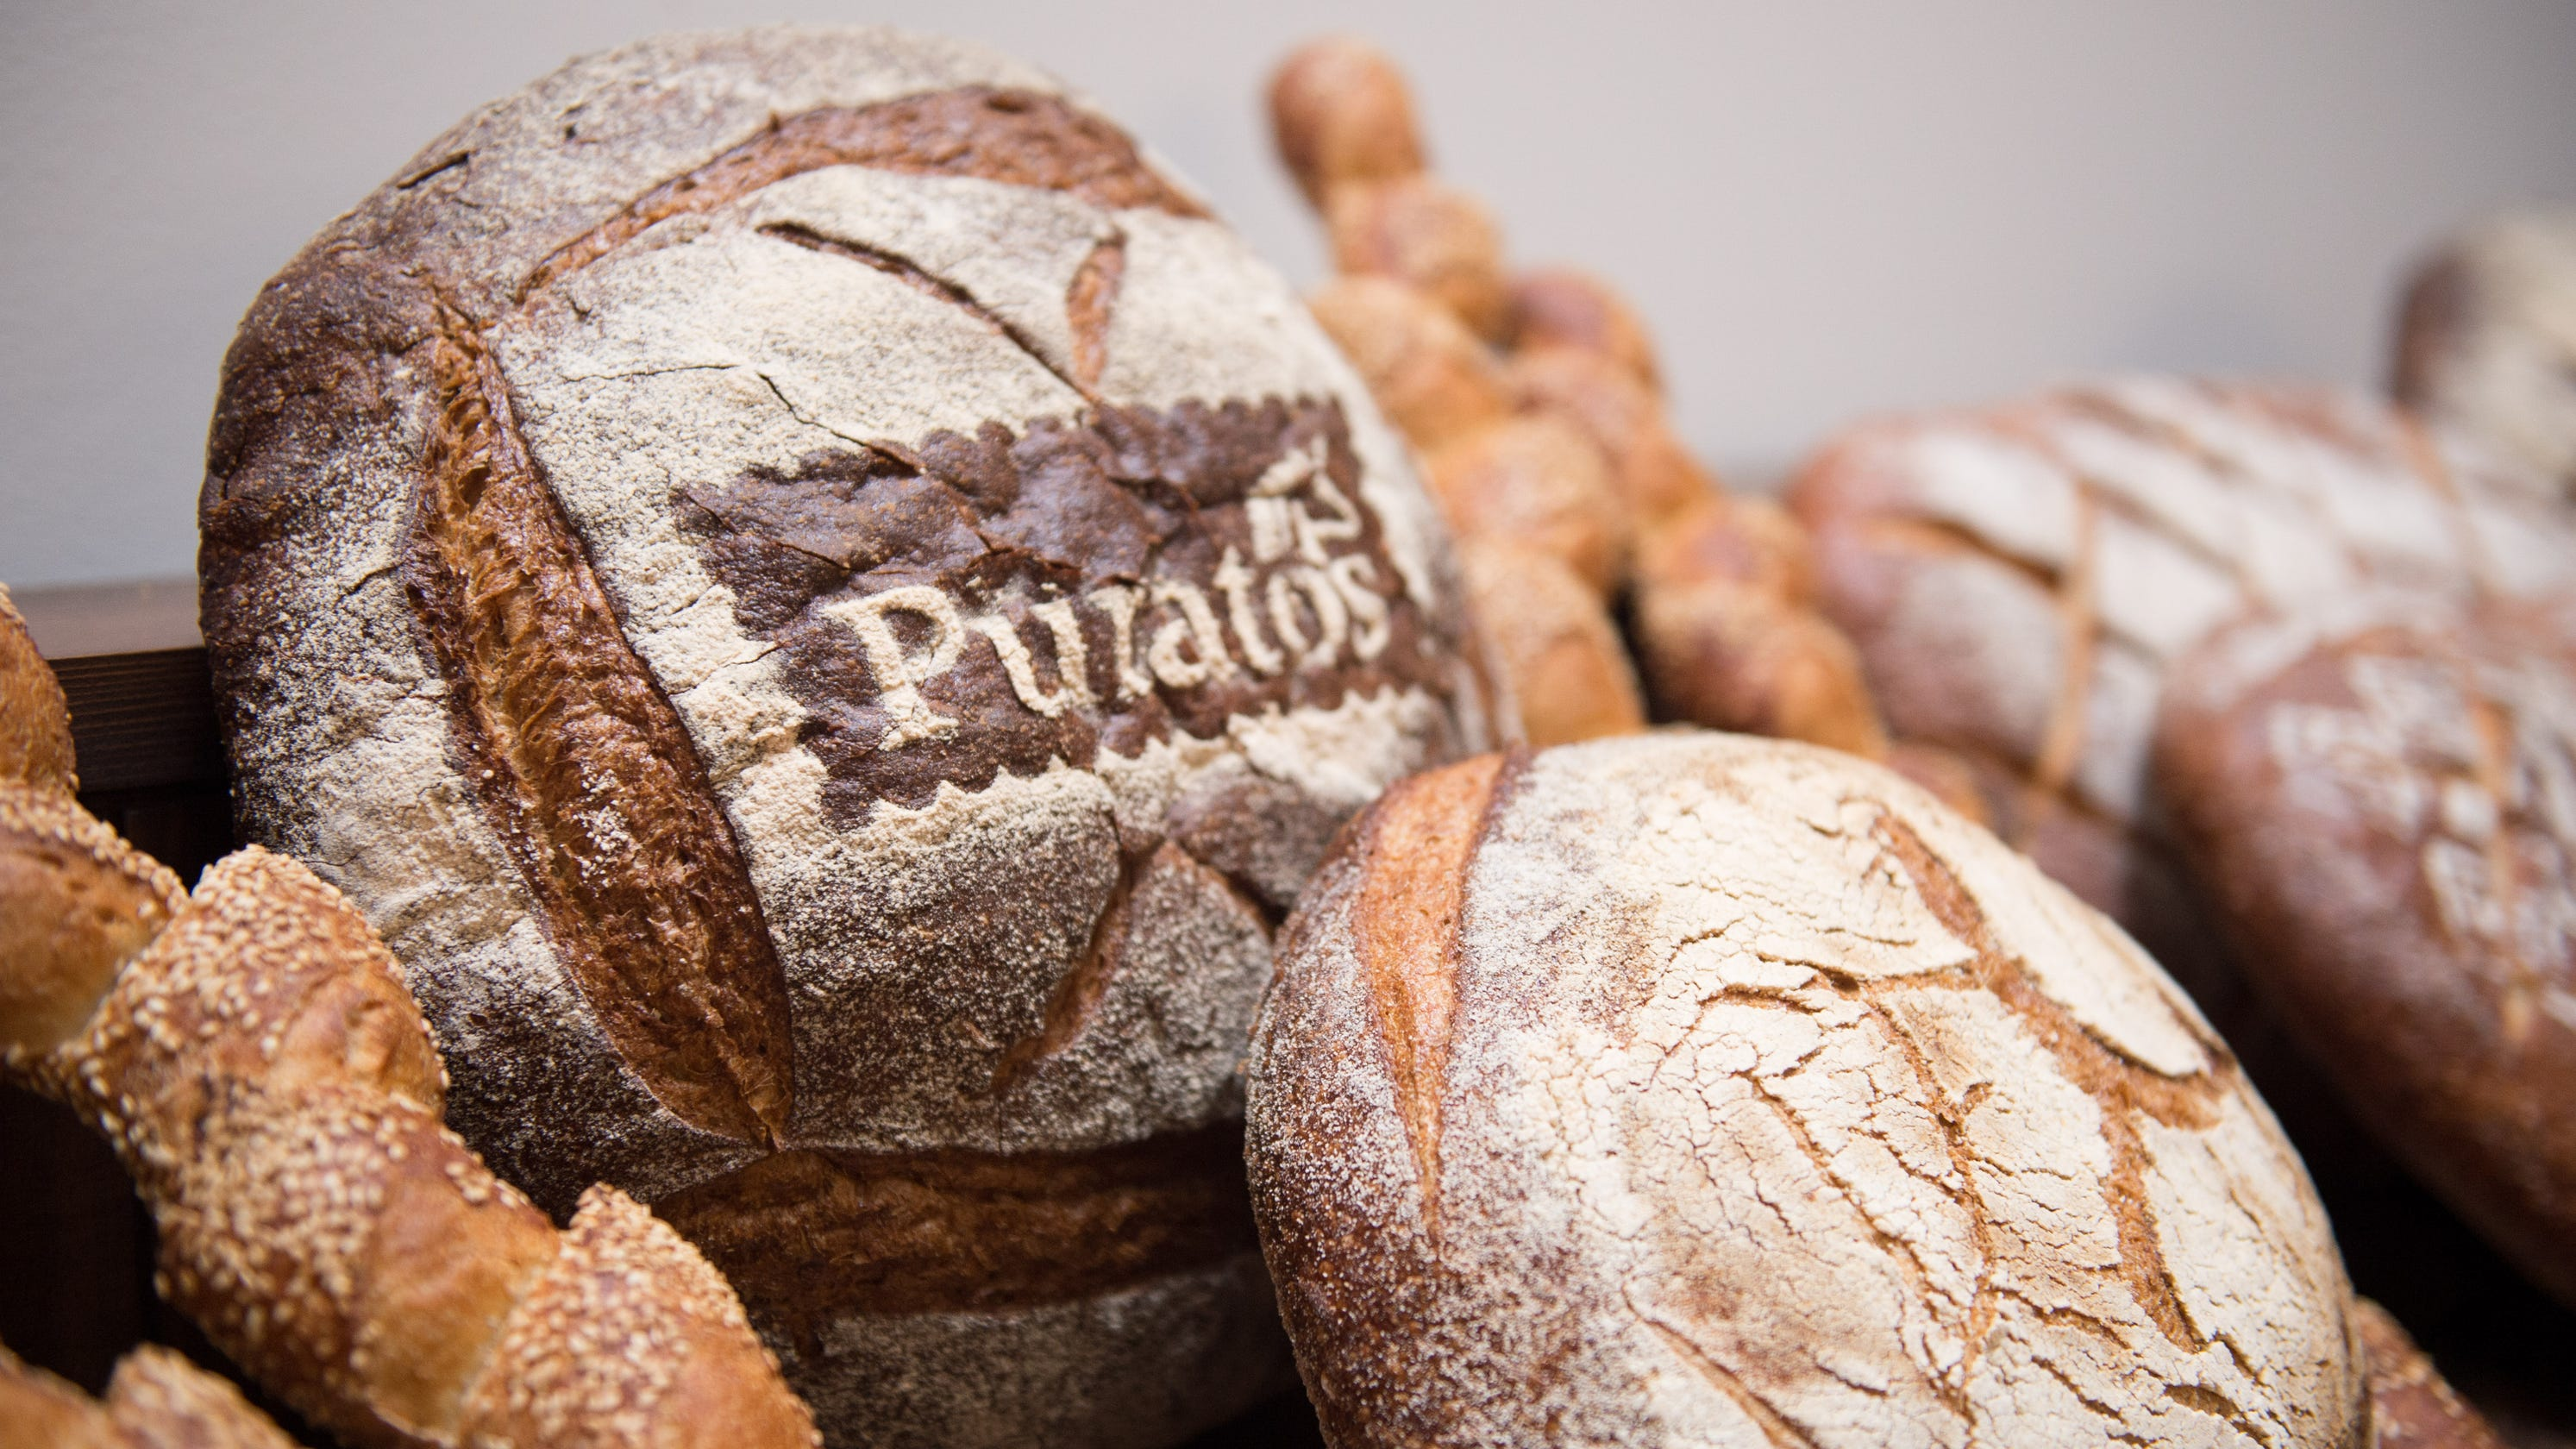 Bakery supply firm Puratos on the rise in Pennsauken